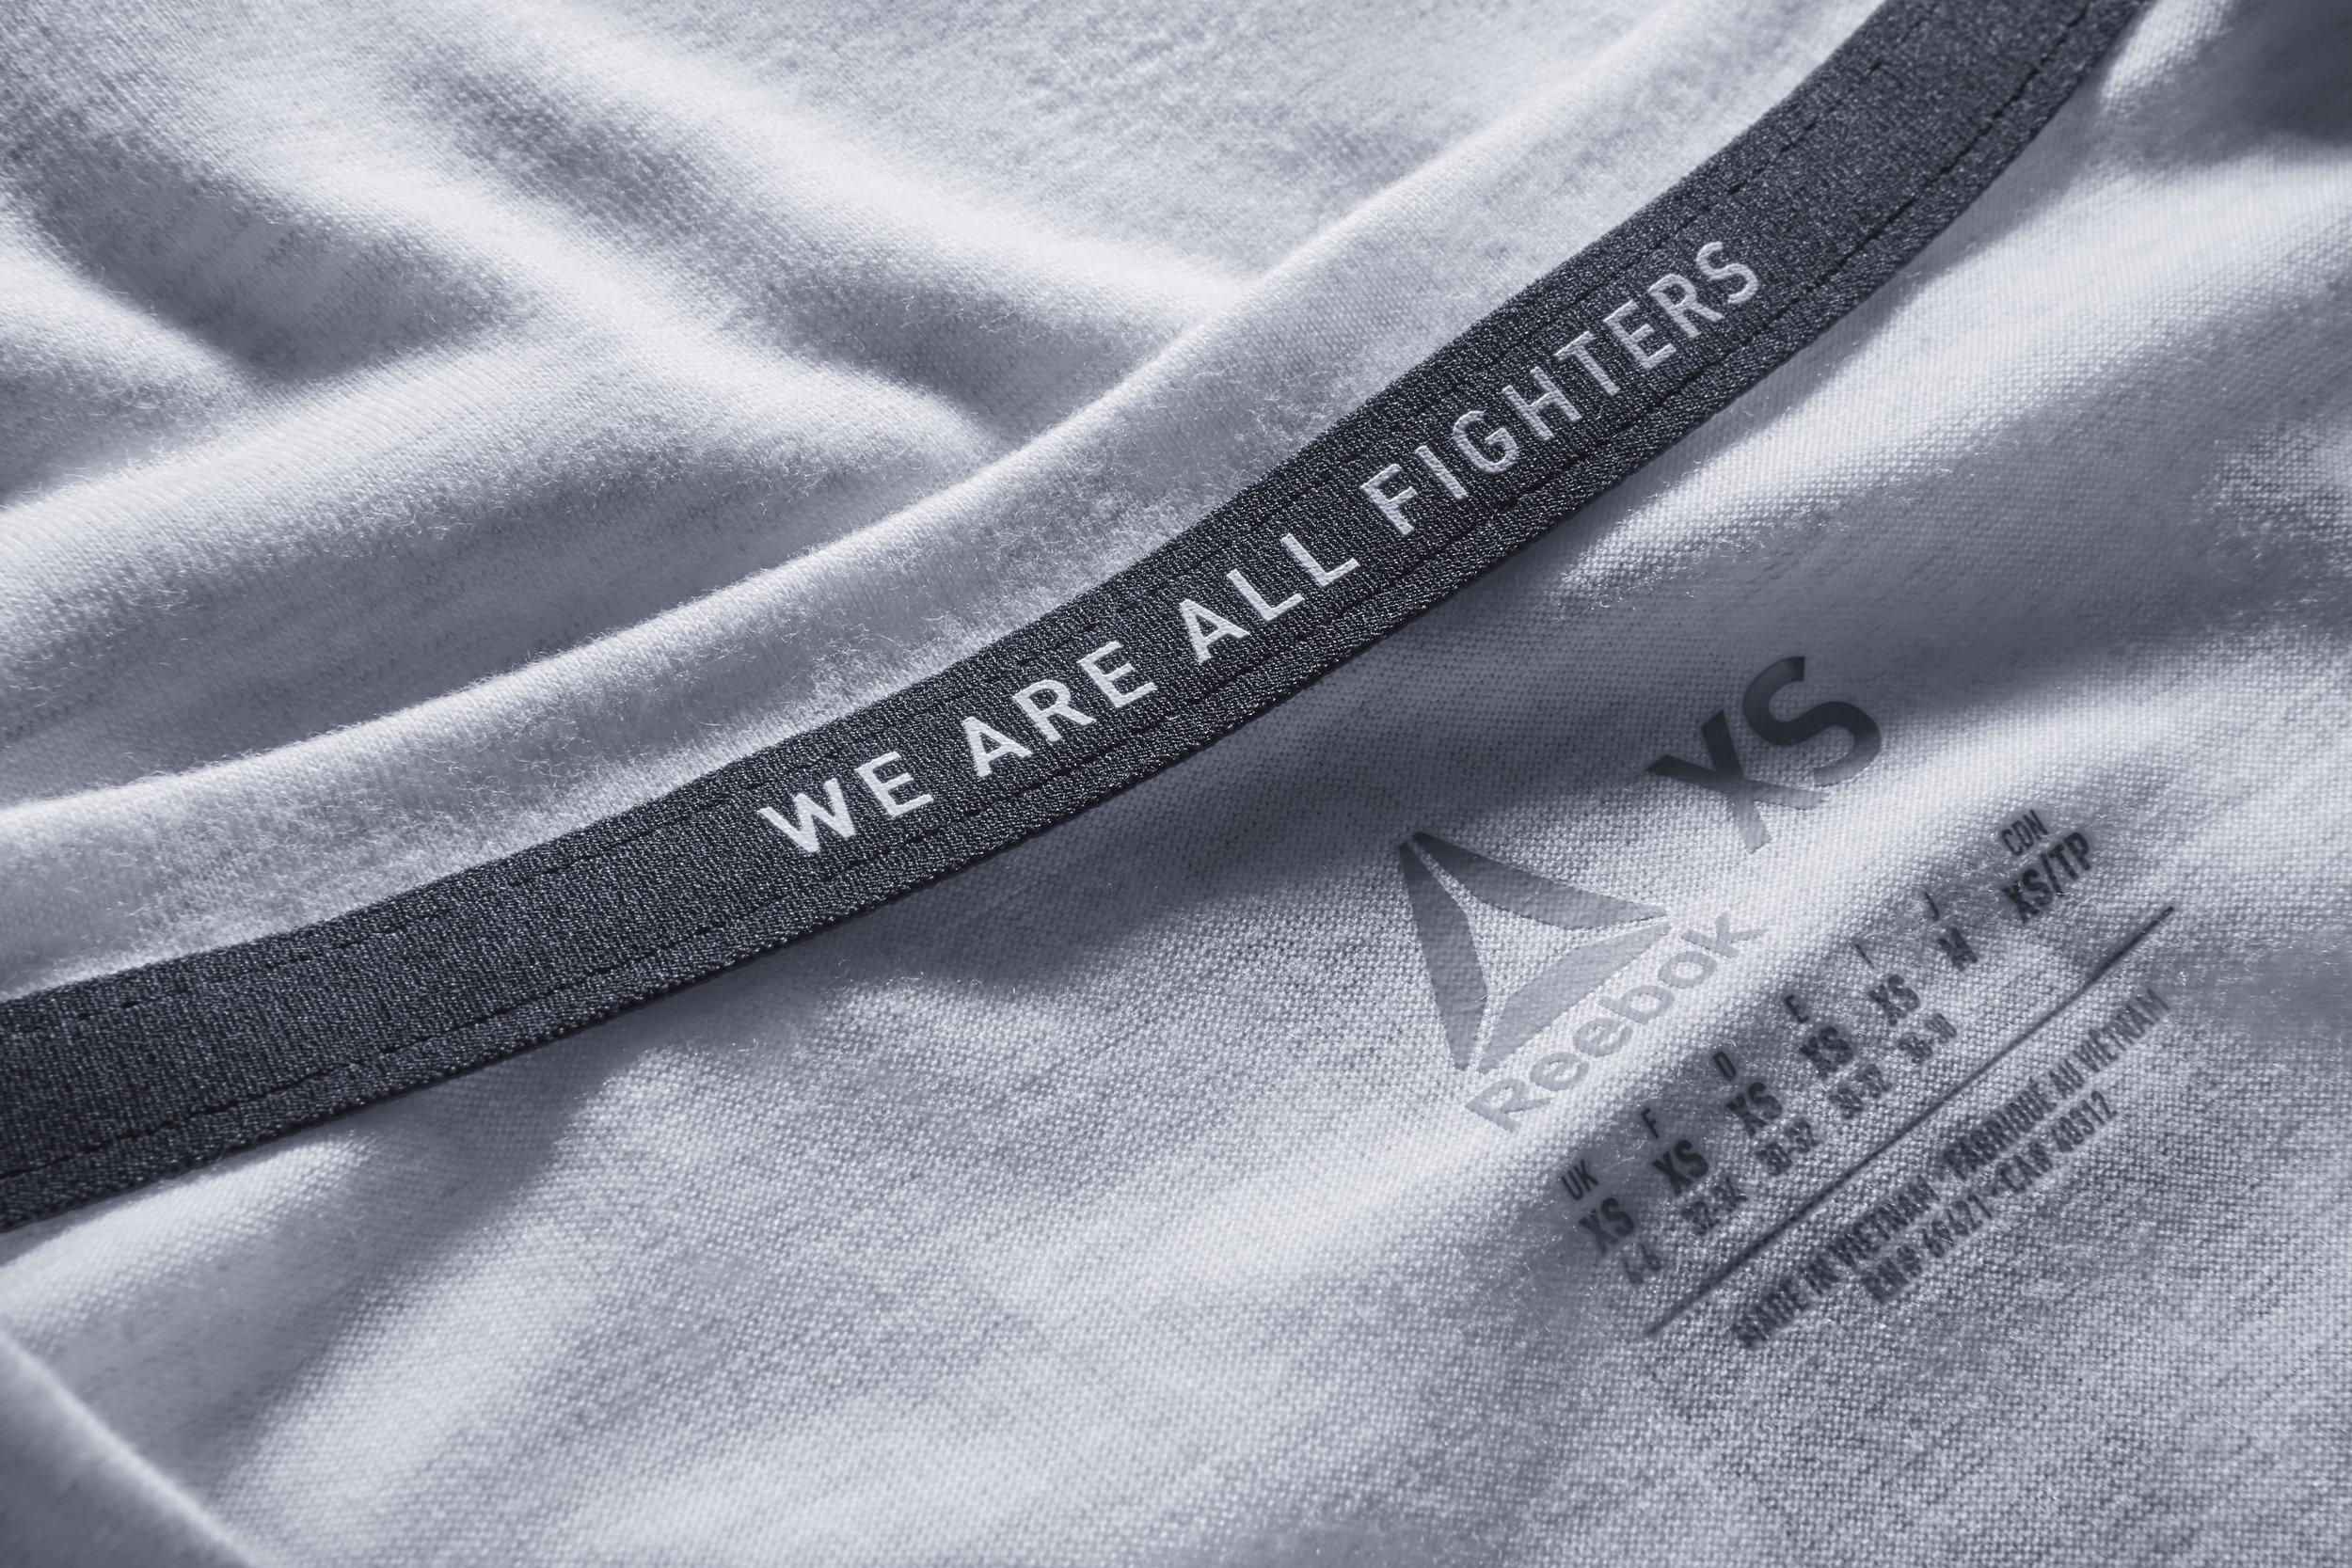 C21101_FW17_UFC_FNC_Tee_White_Collar_Detail.jpg